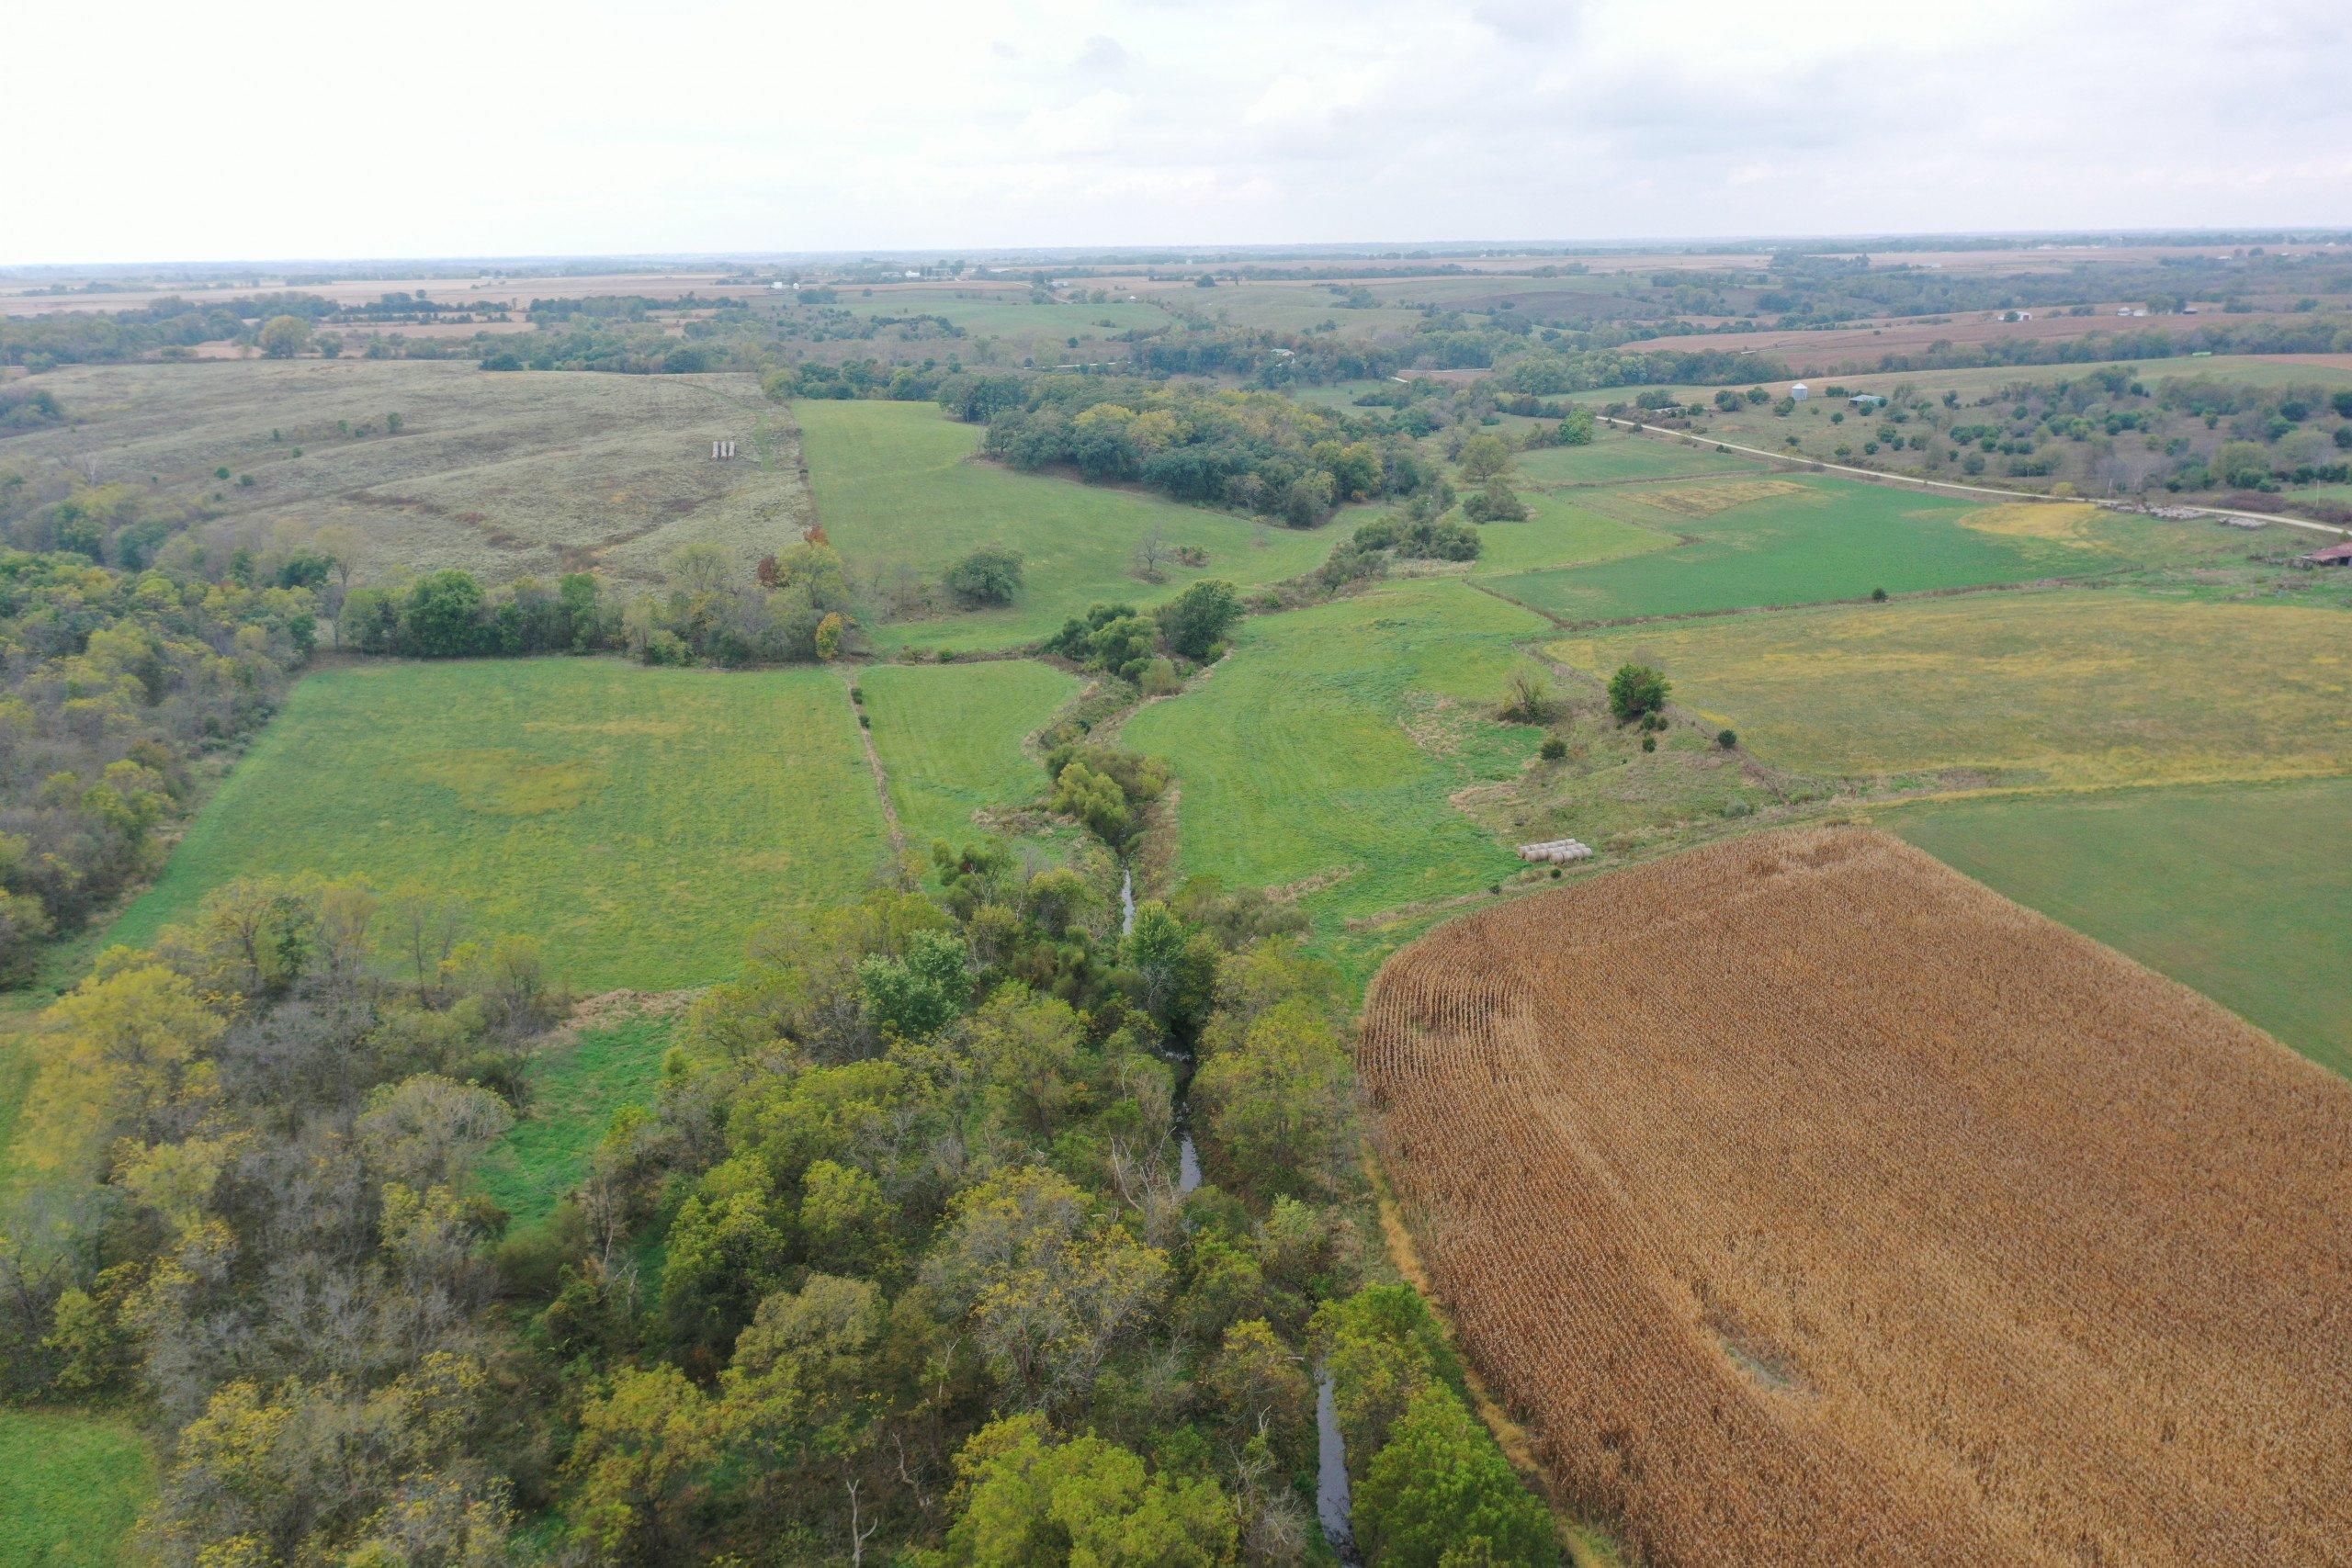 land-warren-county-iowa-200-acres-listing-number-15810-DJI_0595-0.jpg